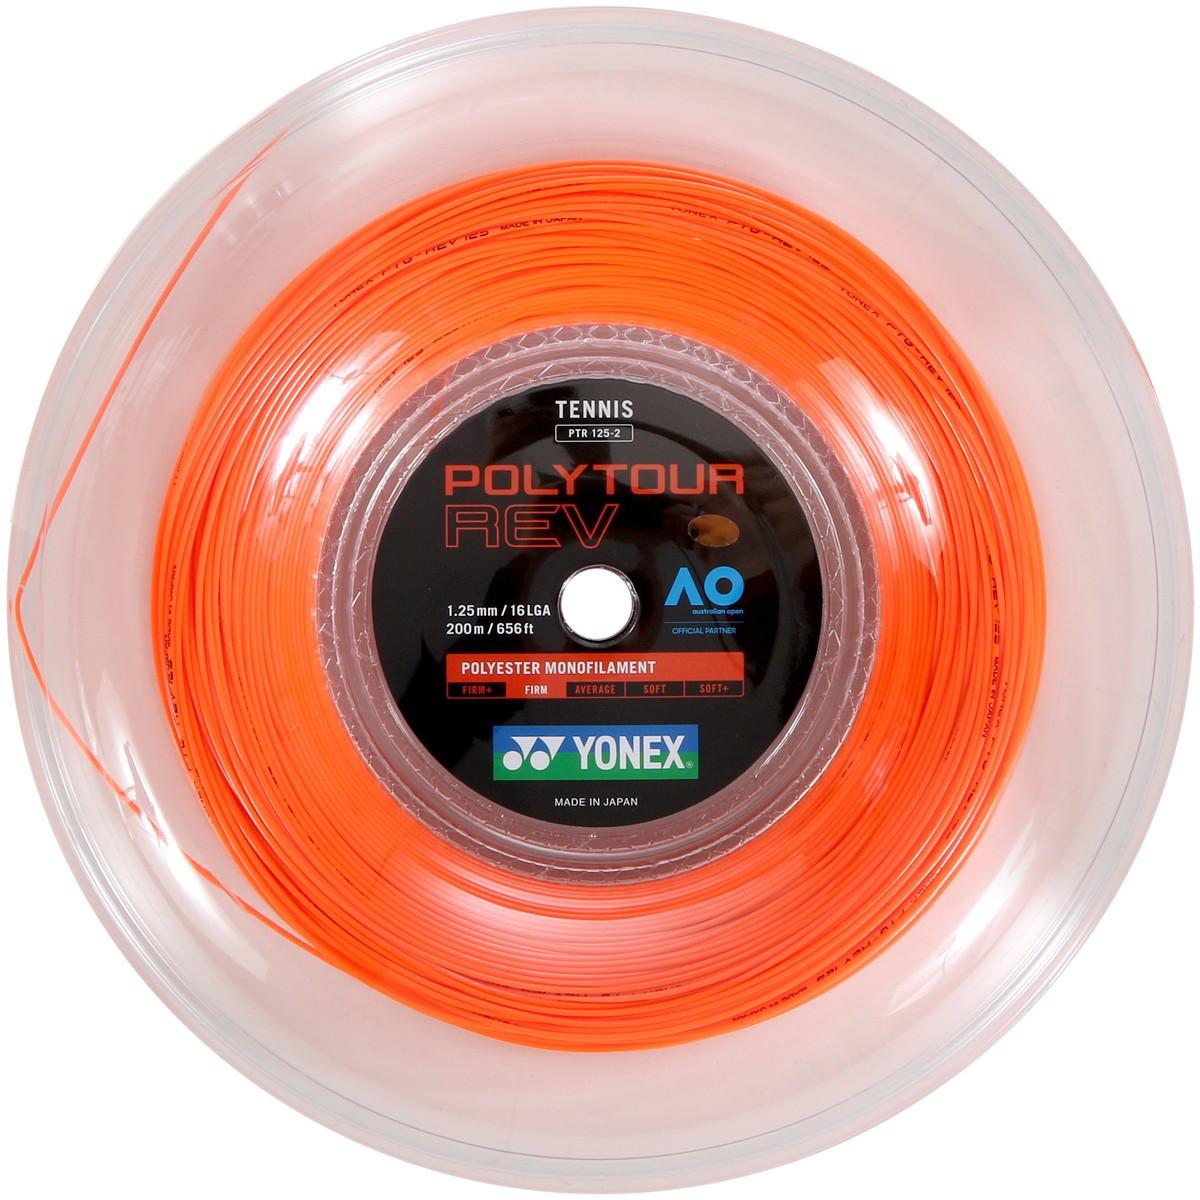 Corda Yonex Poly Tour Rev 1.25mm Laranja Rolo Com 200 Metros